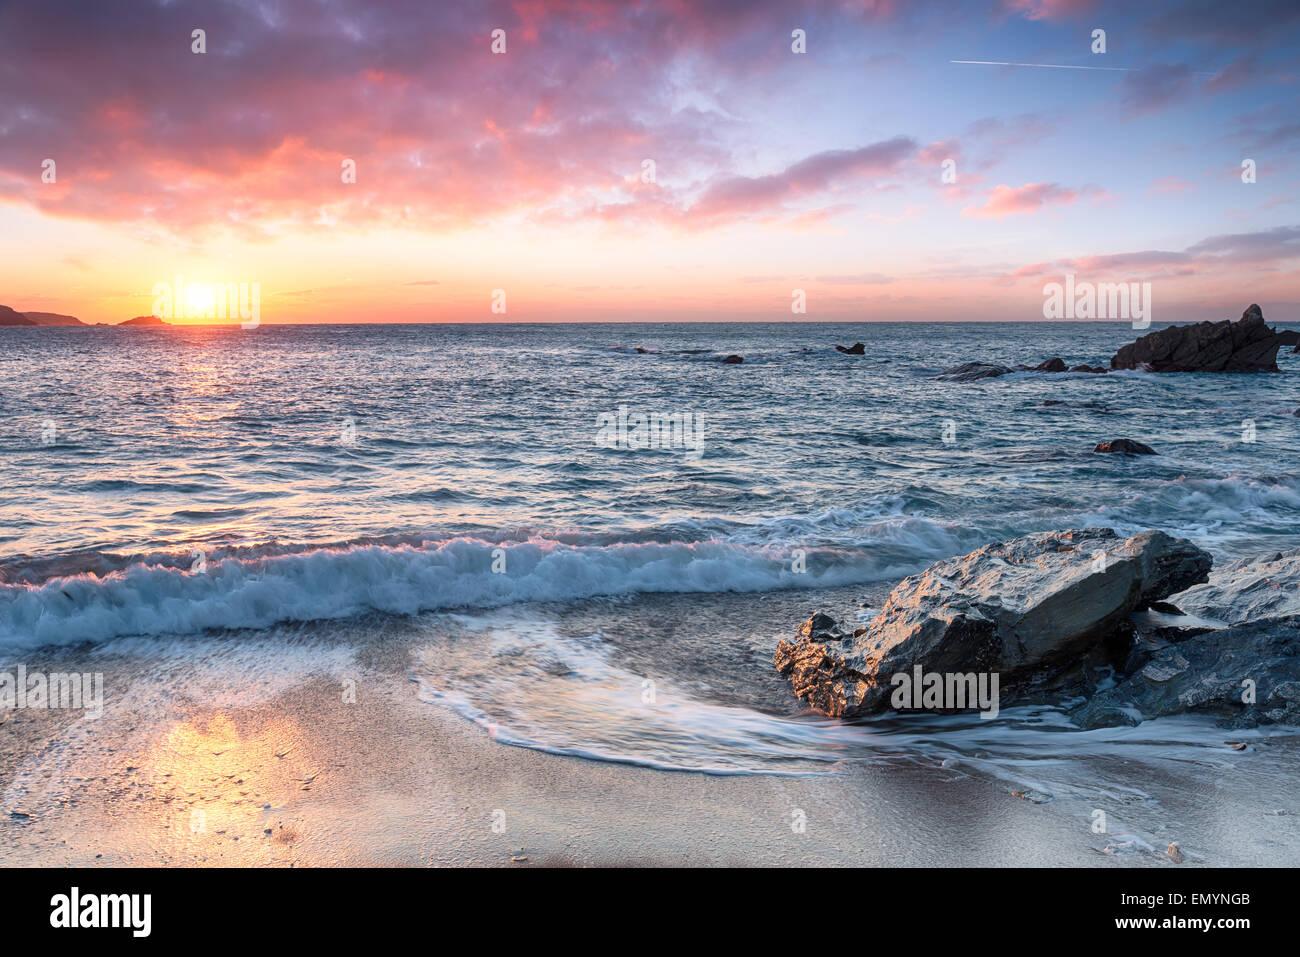 Beautiful beach at sunset - Stock Image